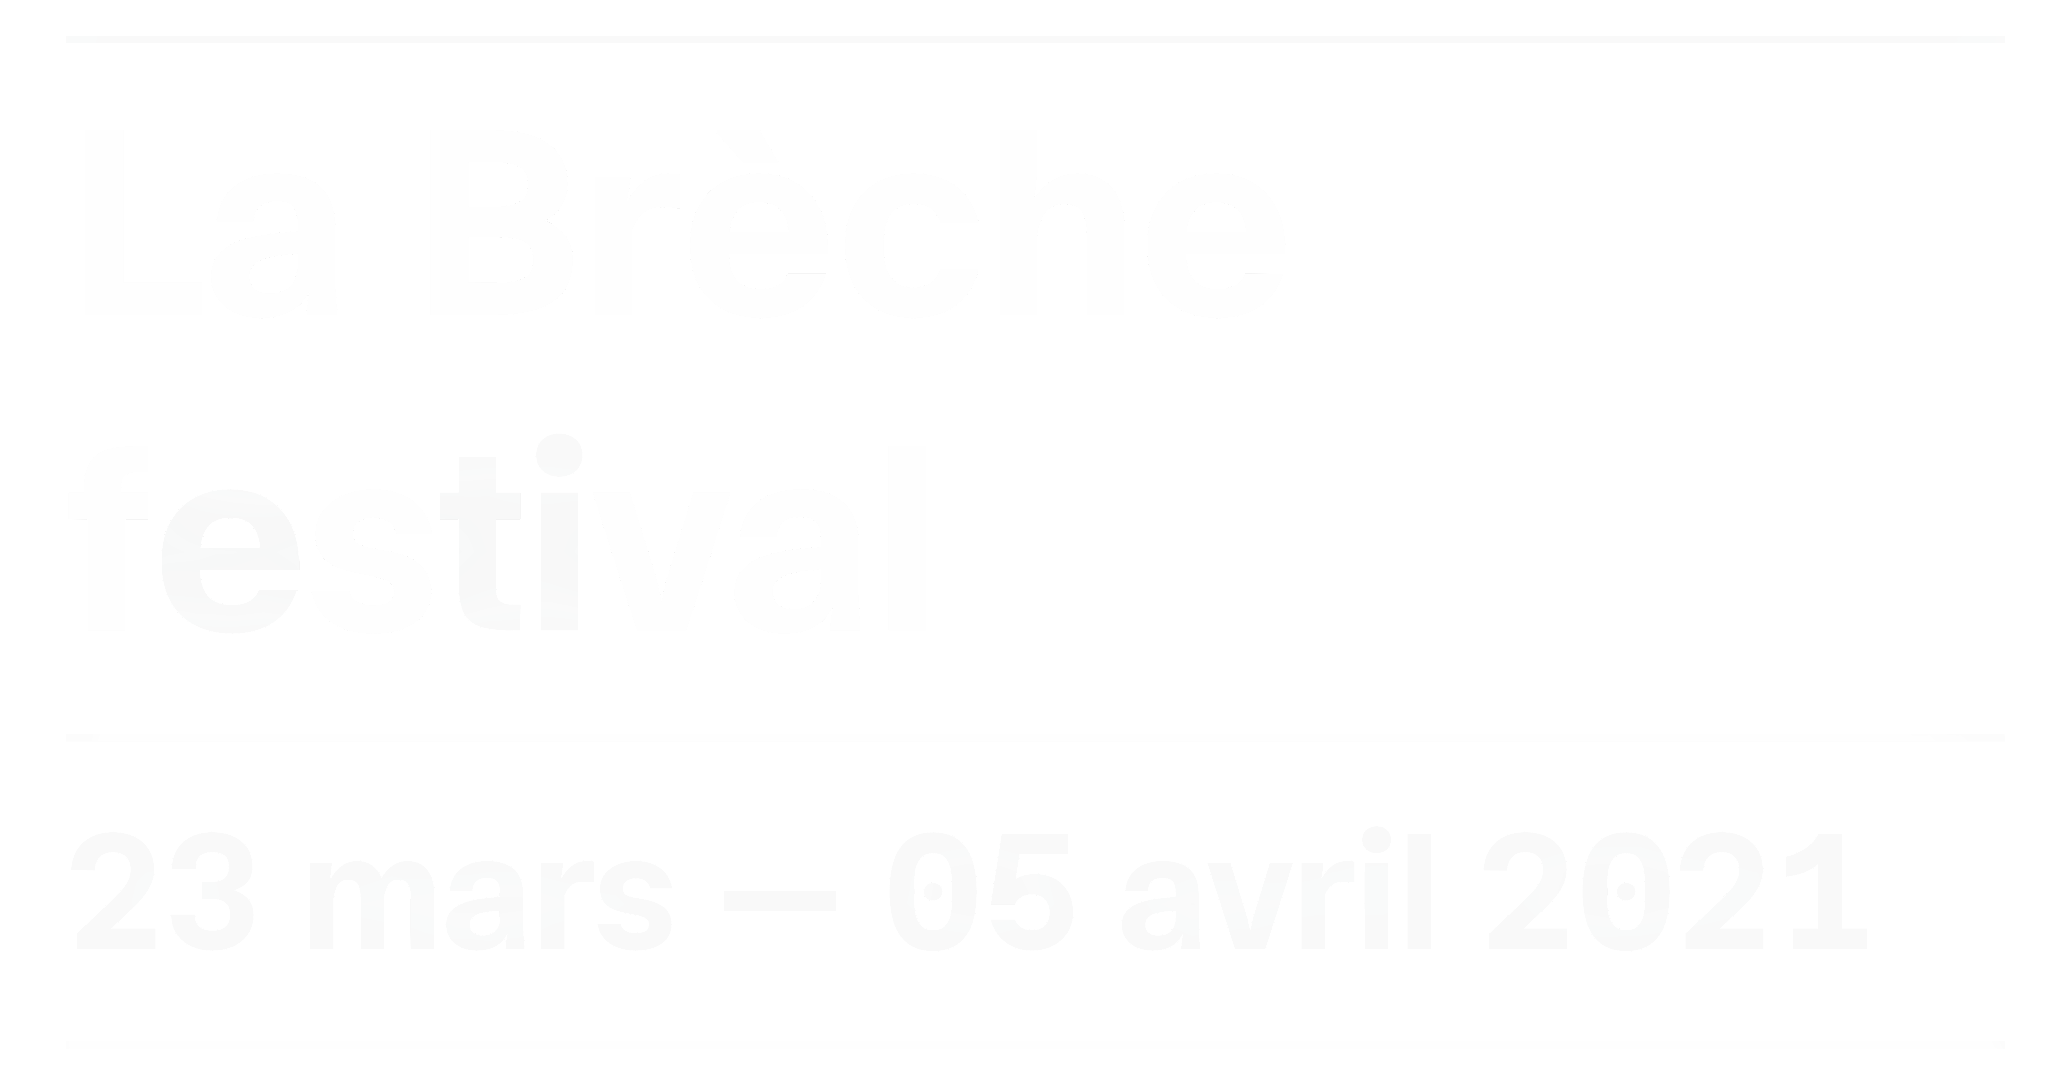 La Brèche festival